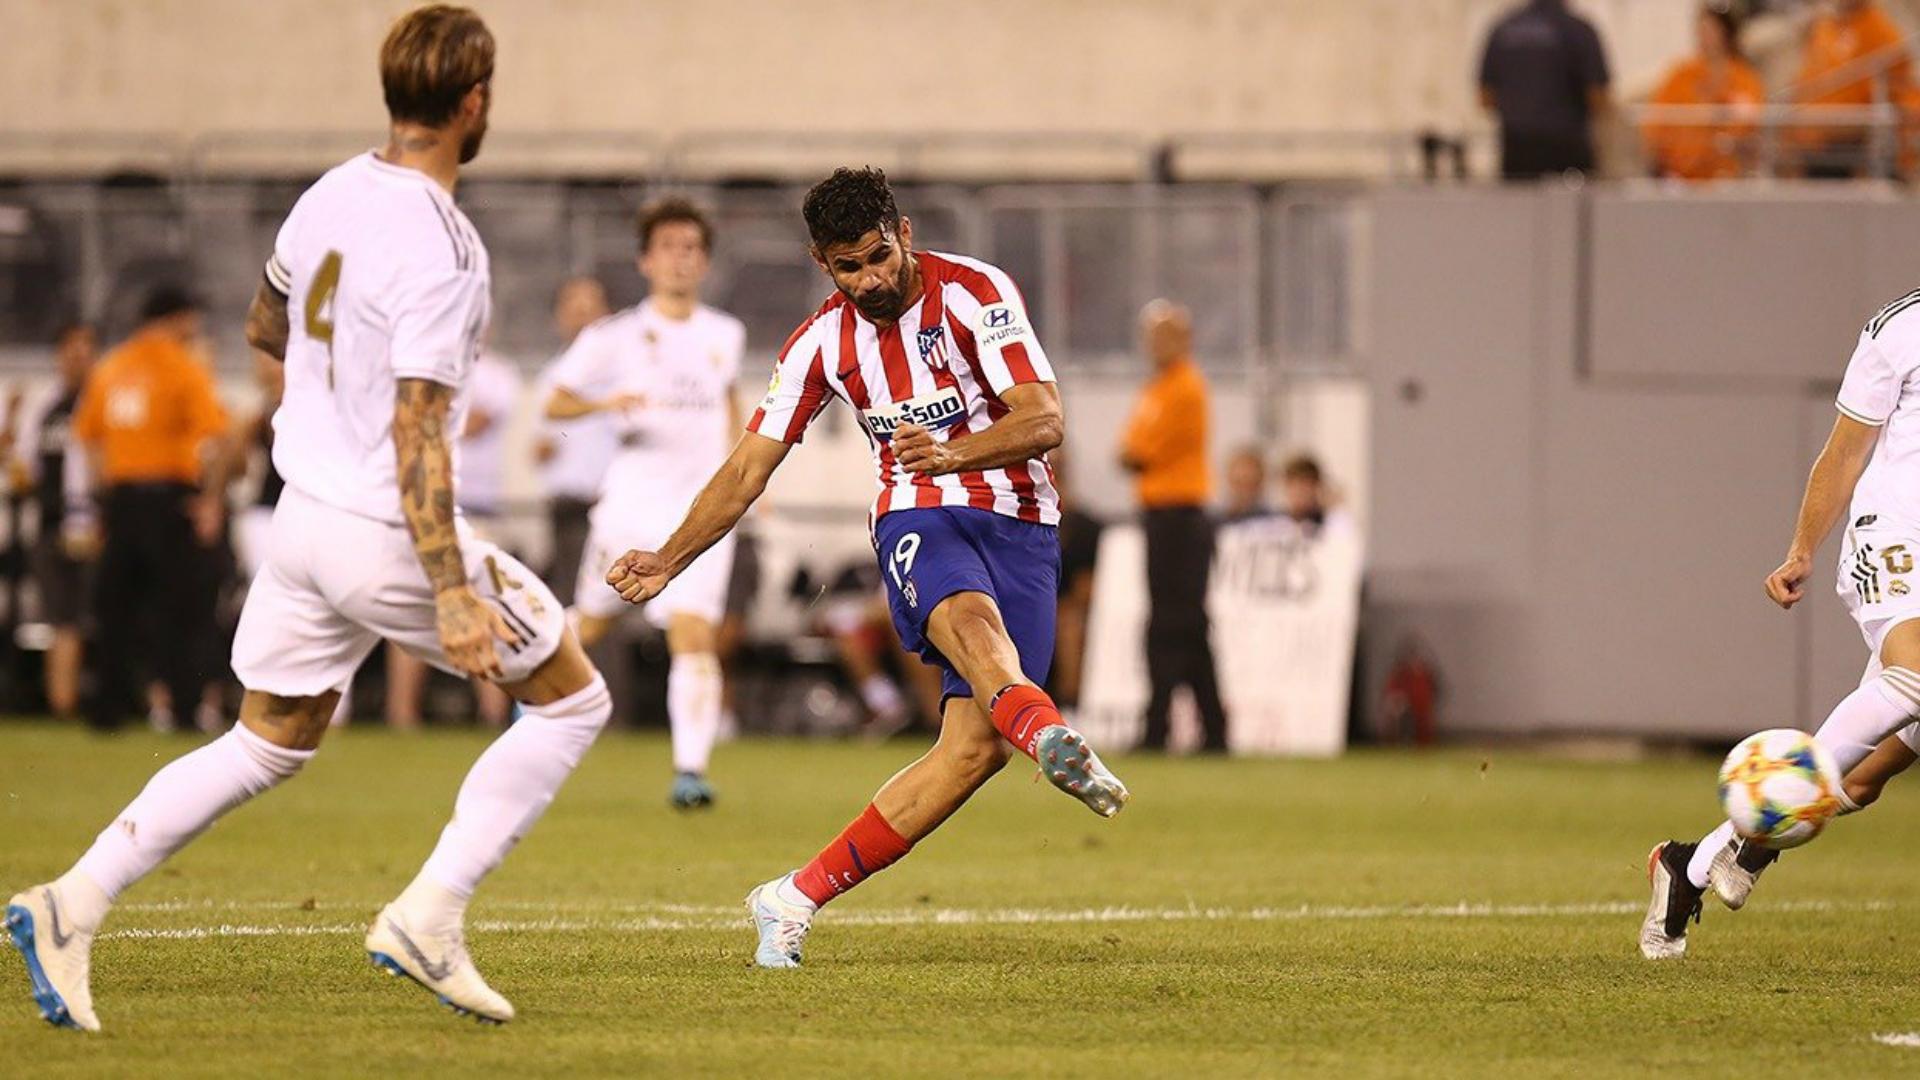 Real Madrid V Atlético Madrid Match Report 27 07 2019 International Champions Cup Goal Com